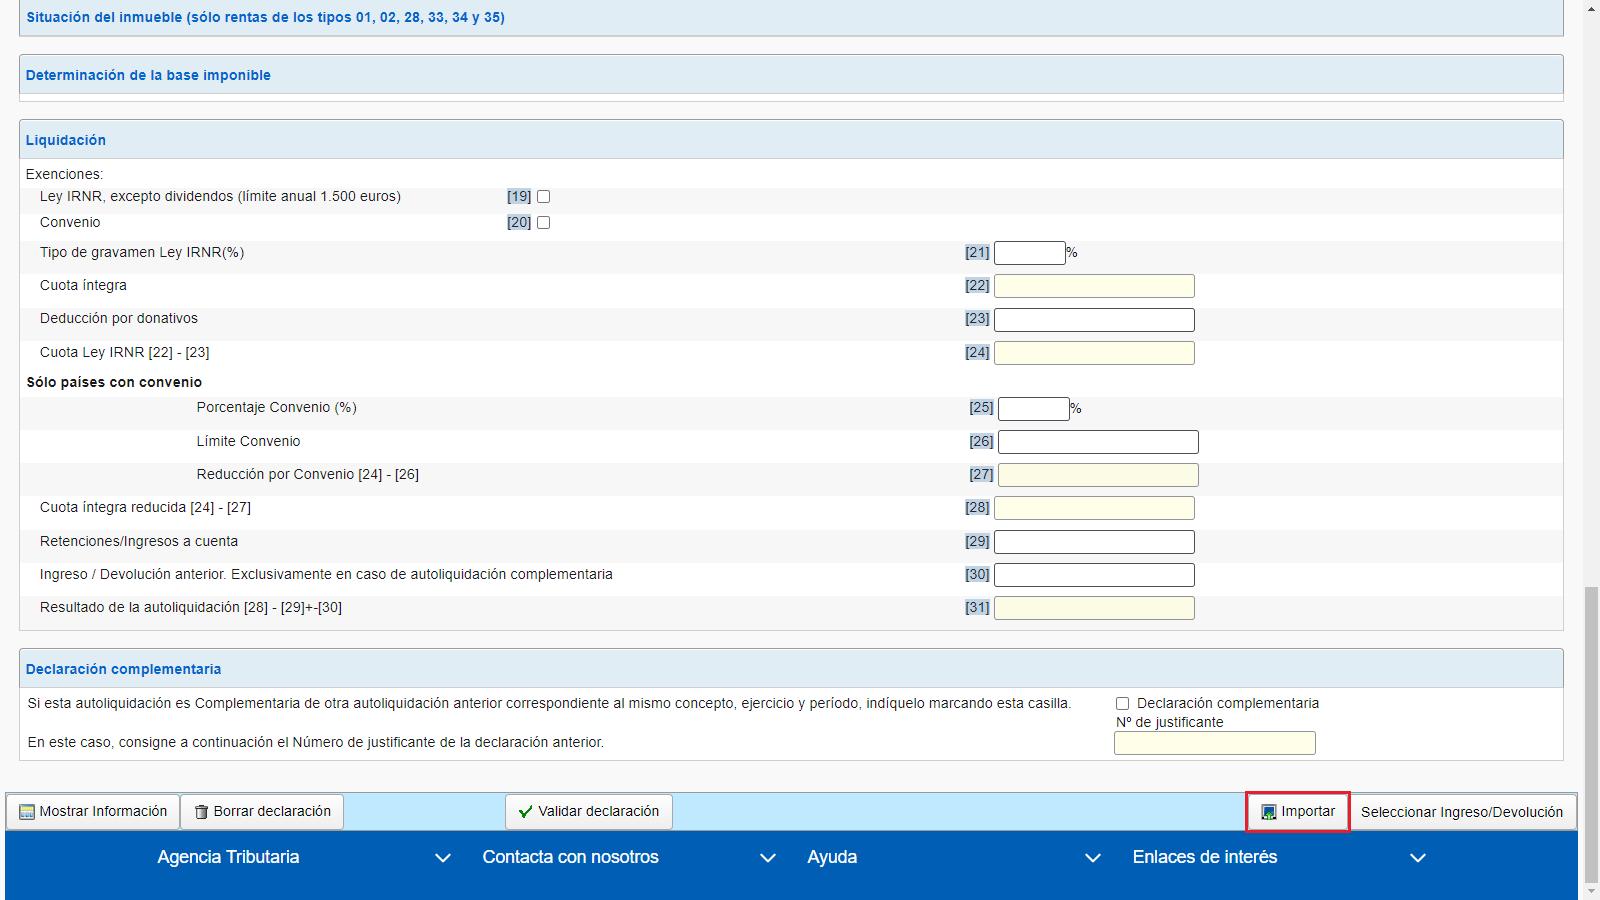 Modelo 210 Formulario web AEAT Importar